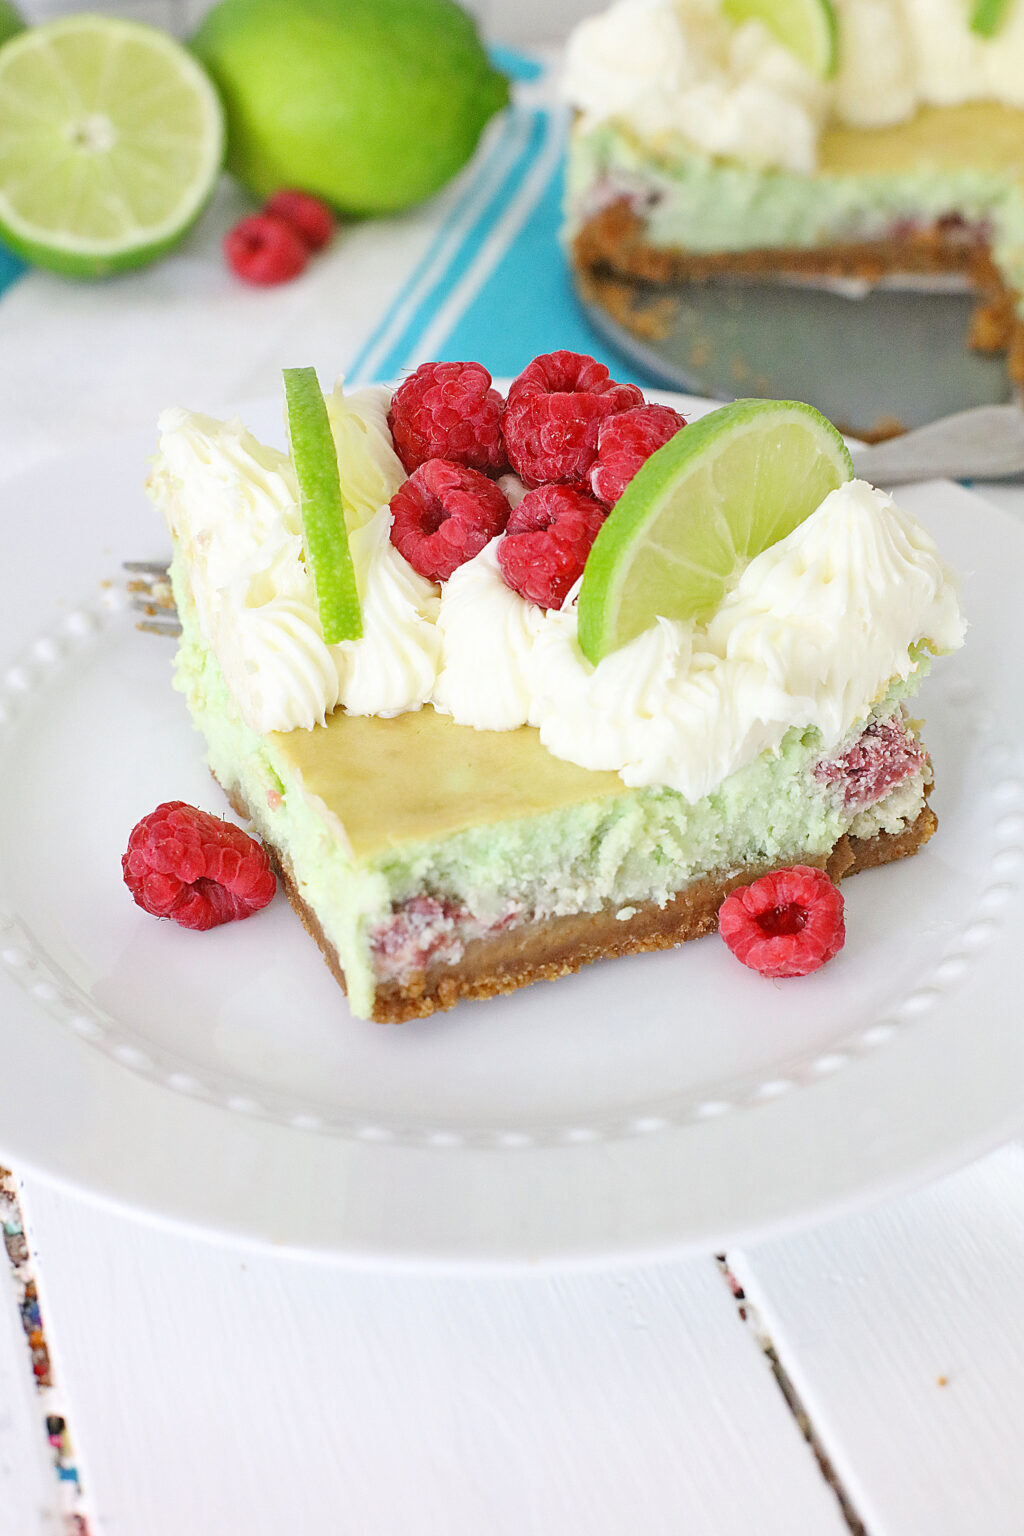 raspberry lime cheesecake slice on a white plate